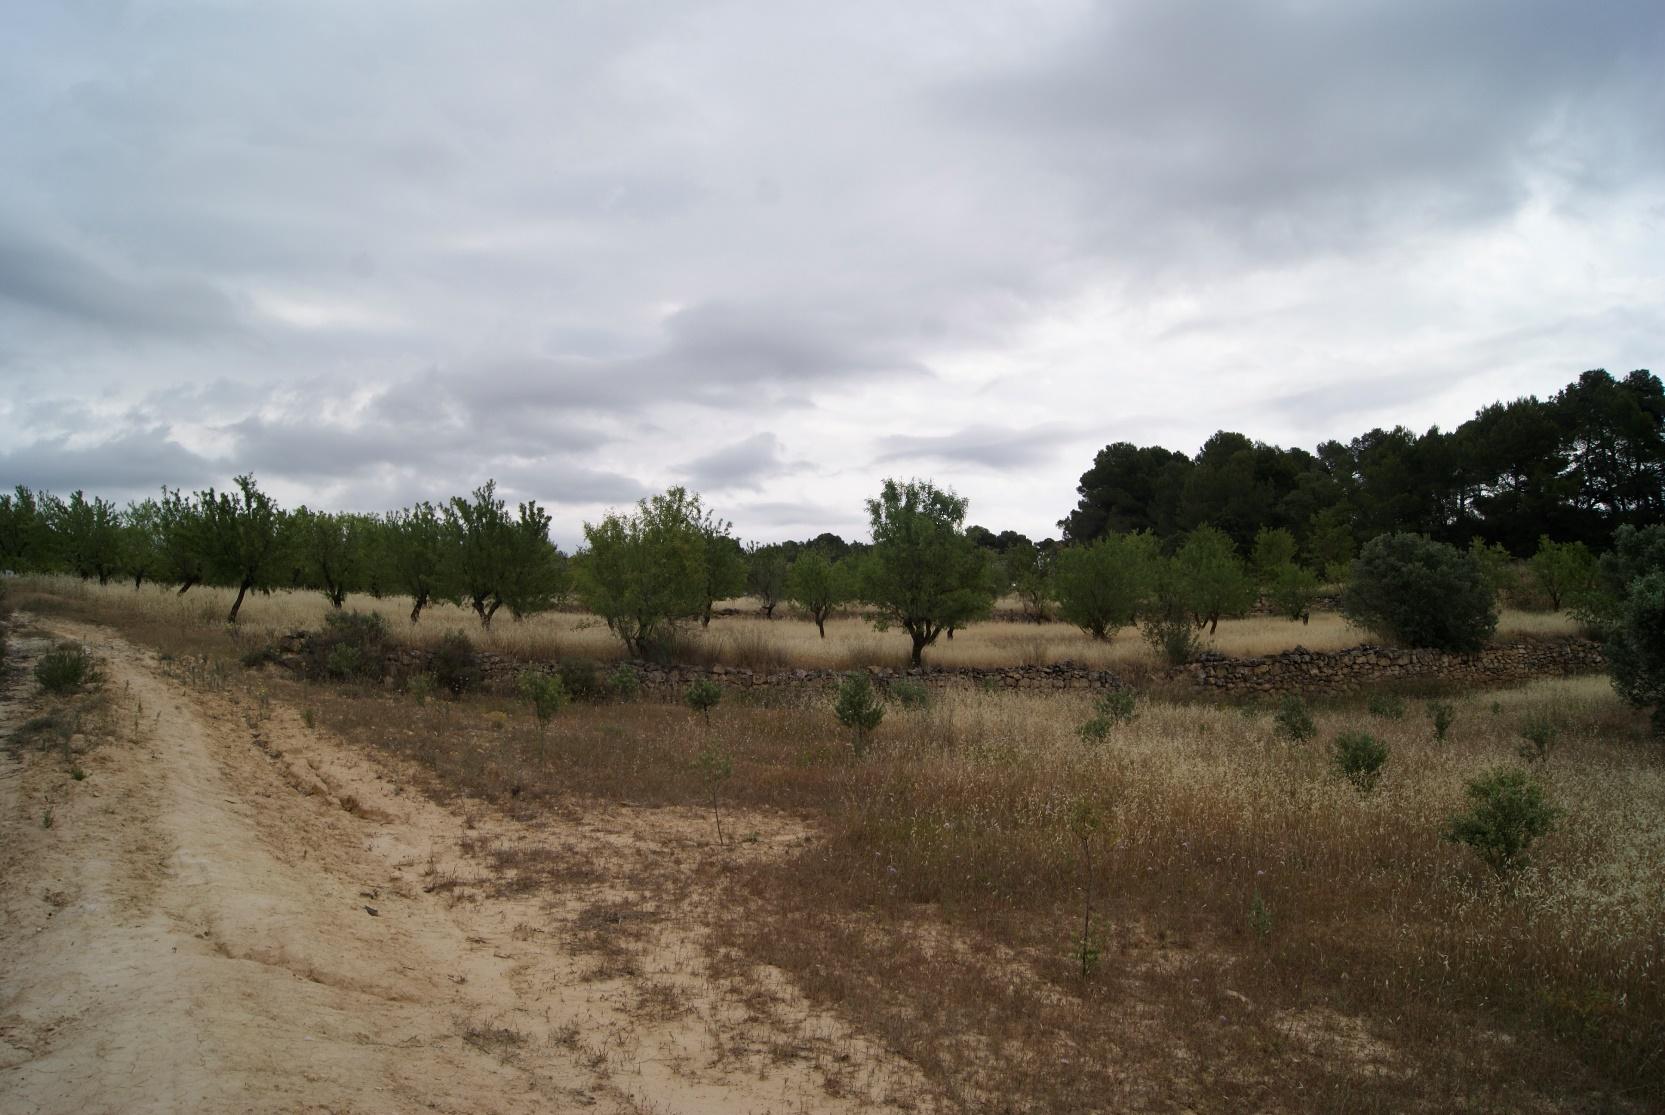 gandesa, ,Maset,Rústica,gandesa,1143